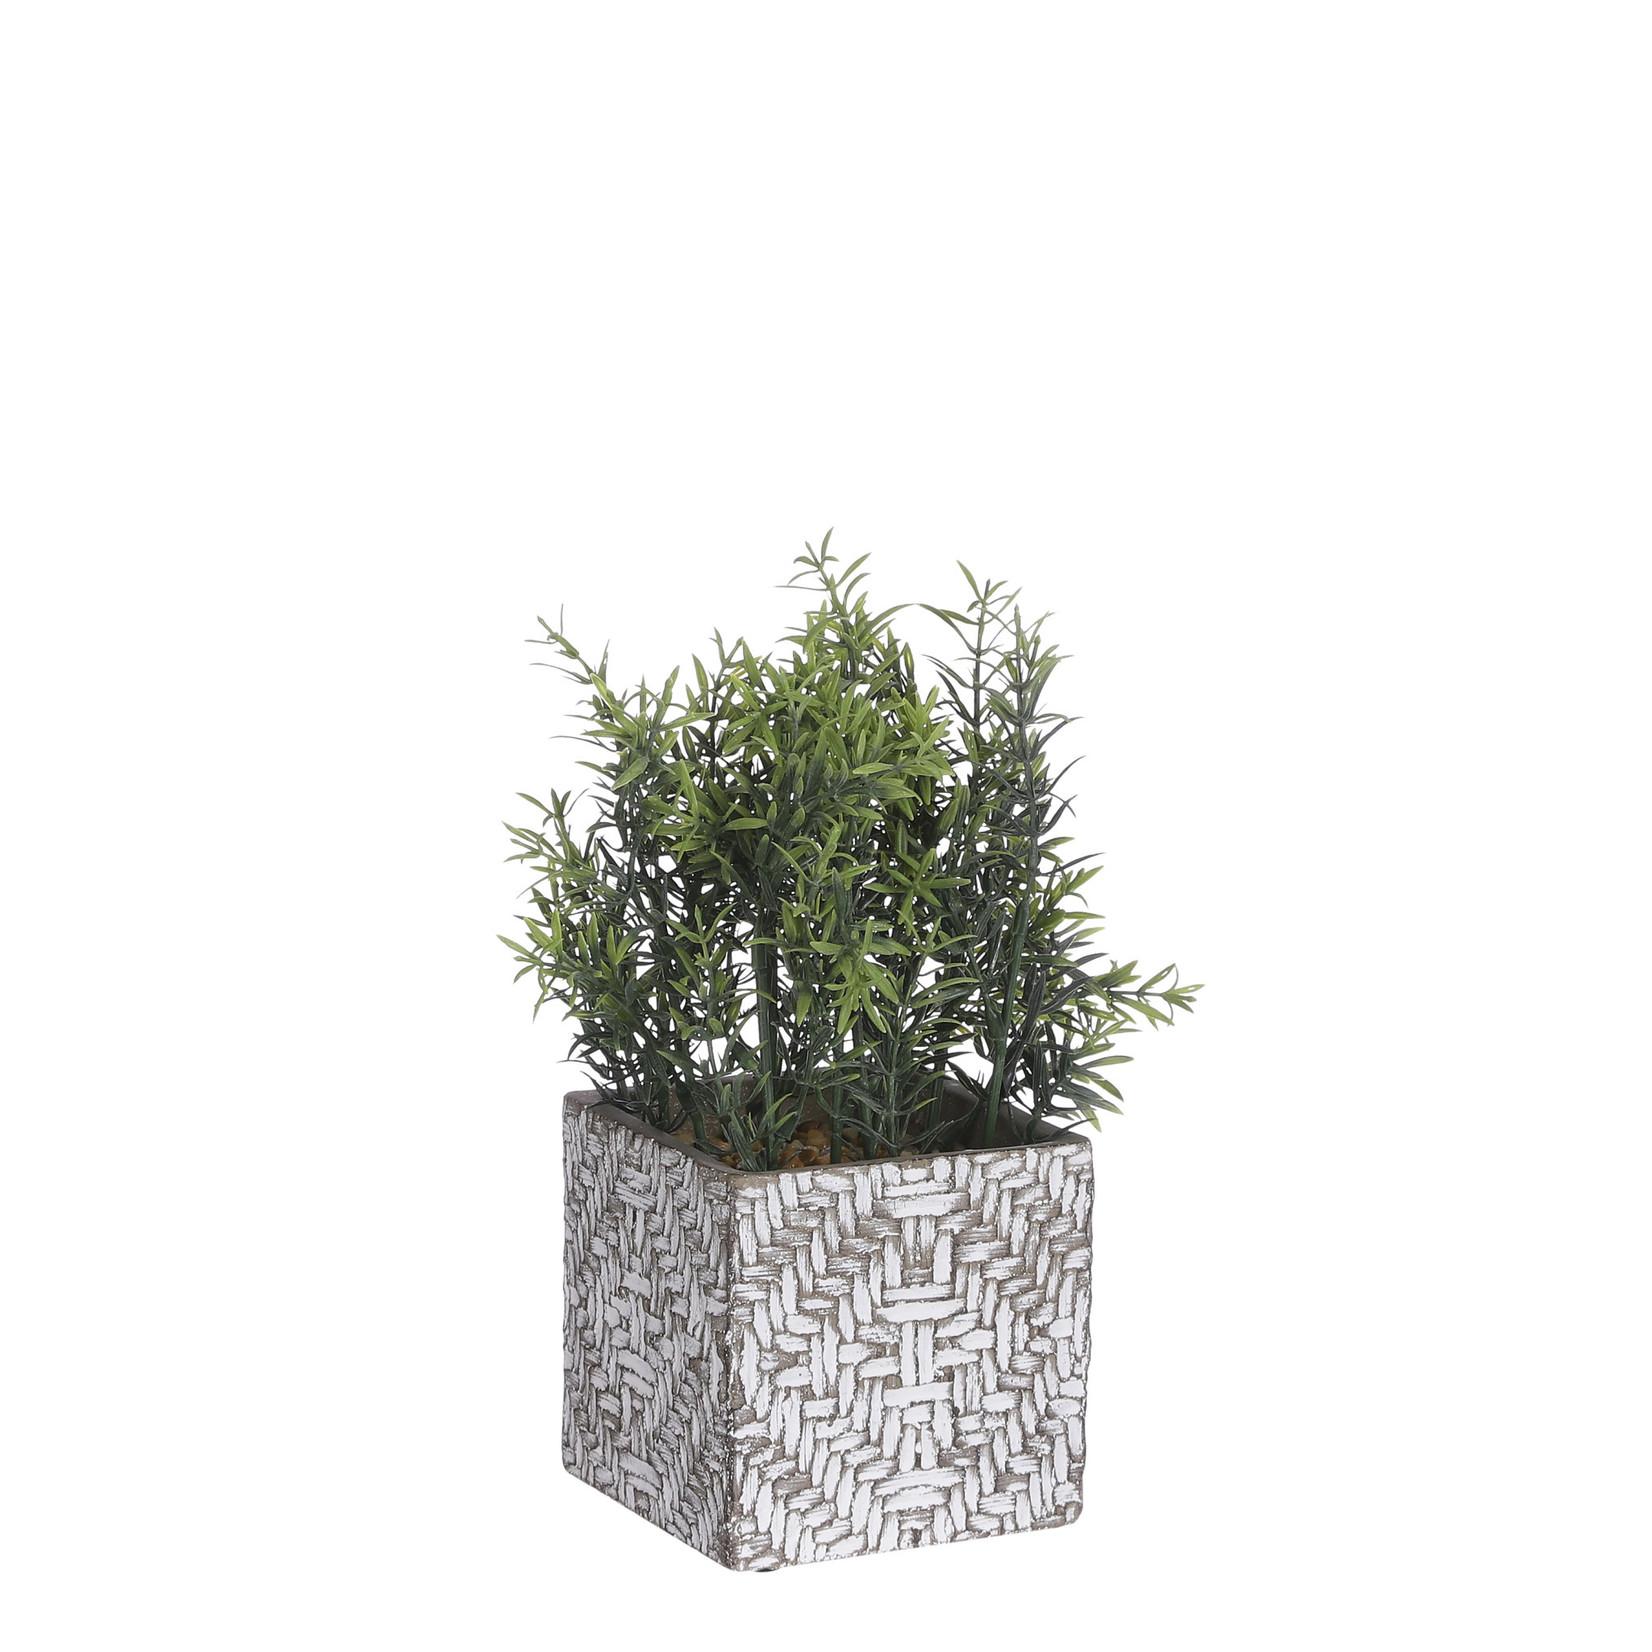 Herbs in pot green